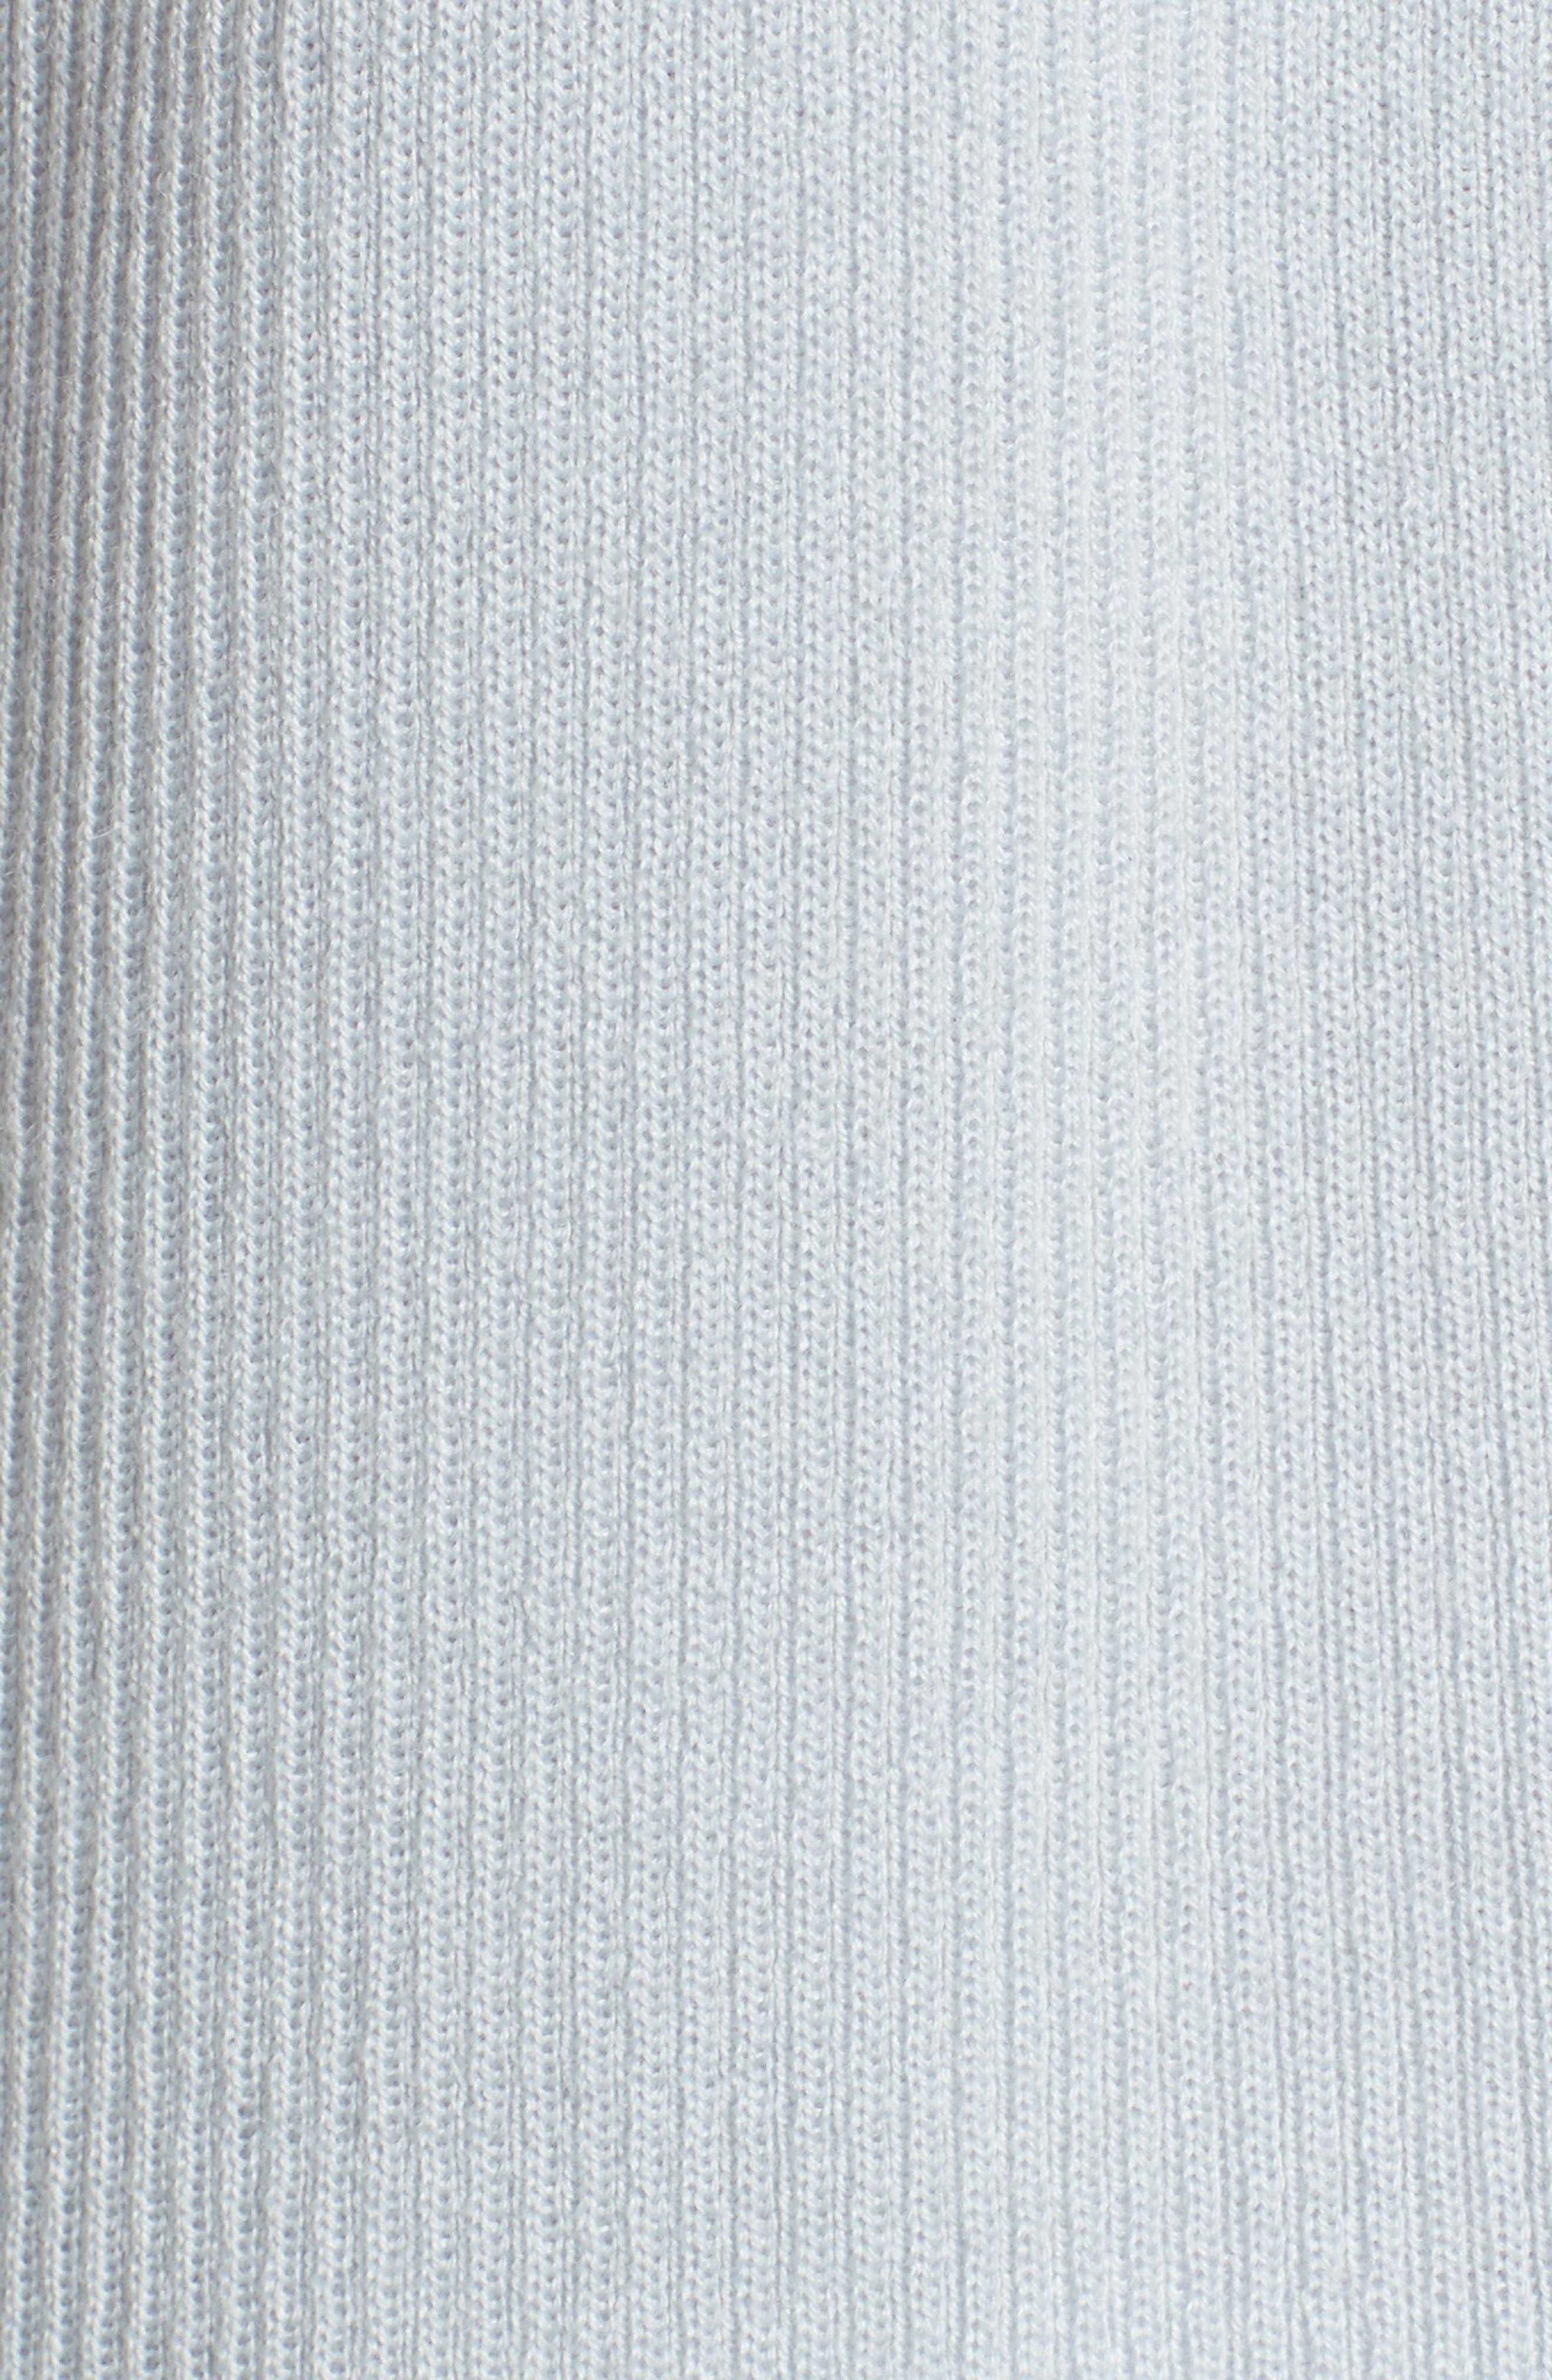 Rib Knit Wool Blend Cardigan,                             Alternate thumbnail 93, color,